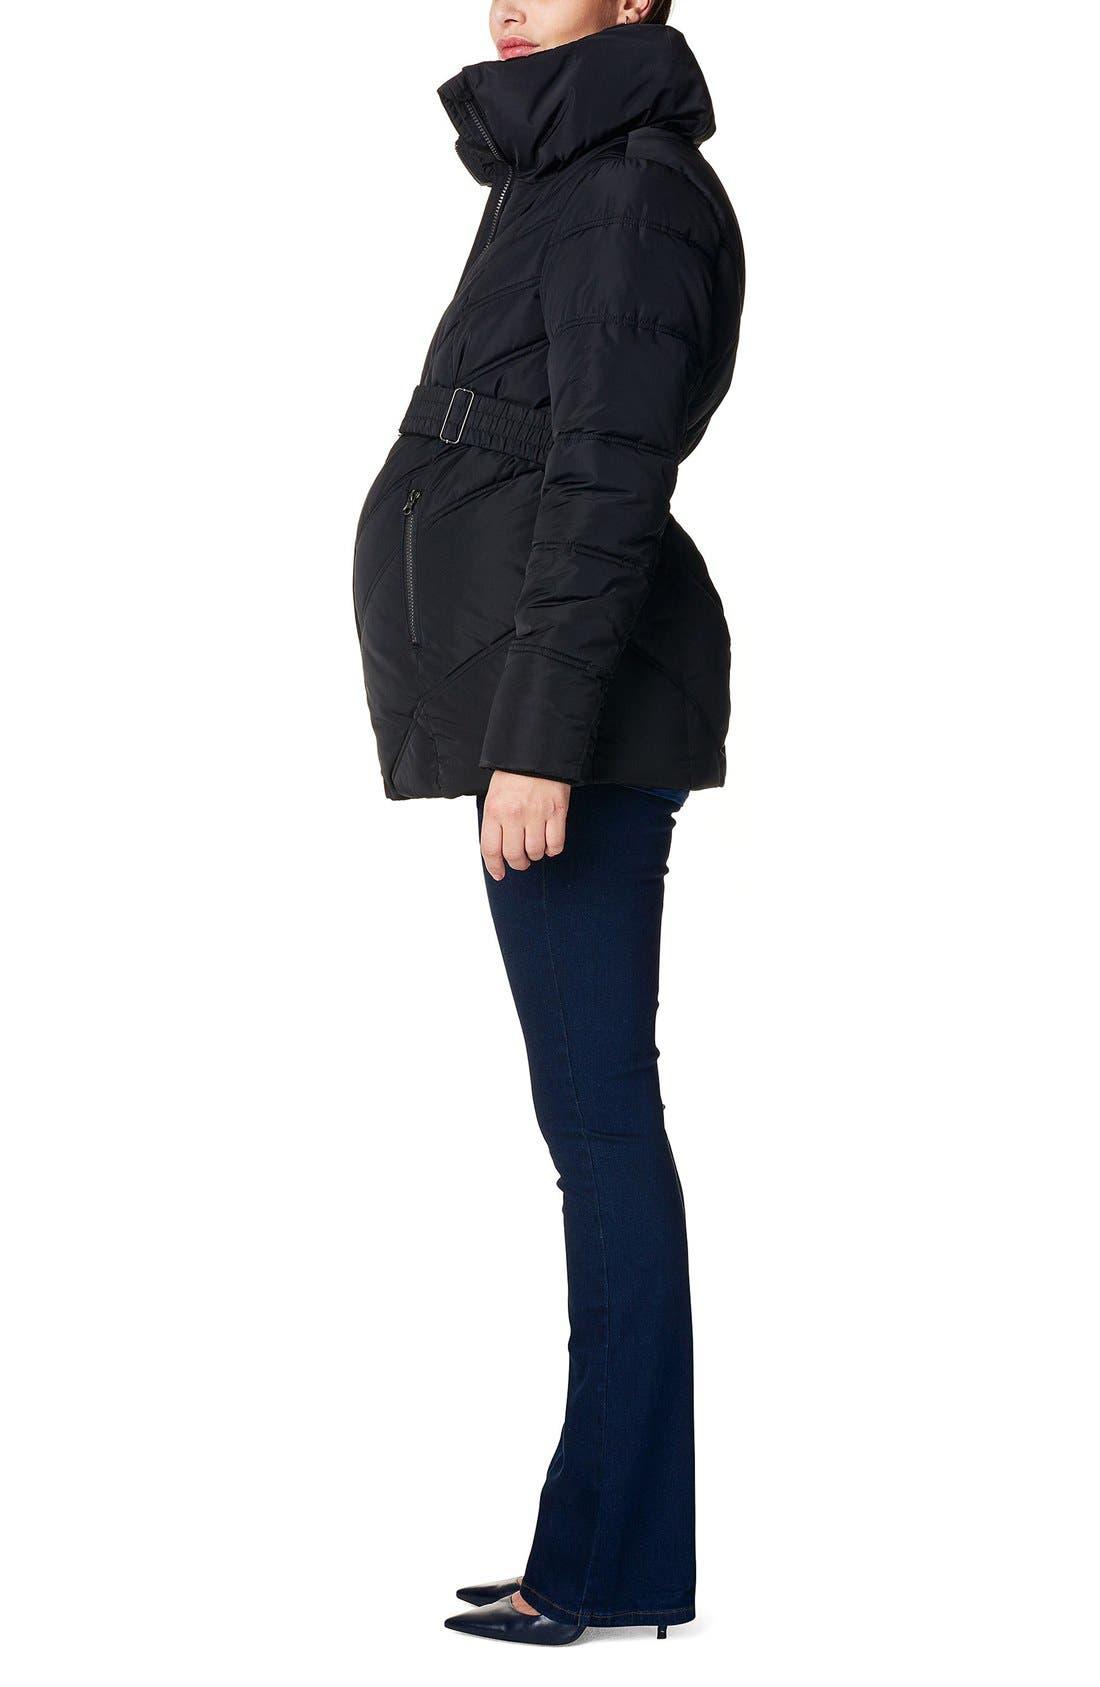 Alternate Image 3  - Noppies 'Lene' Quilted Maternity Jacket